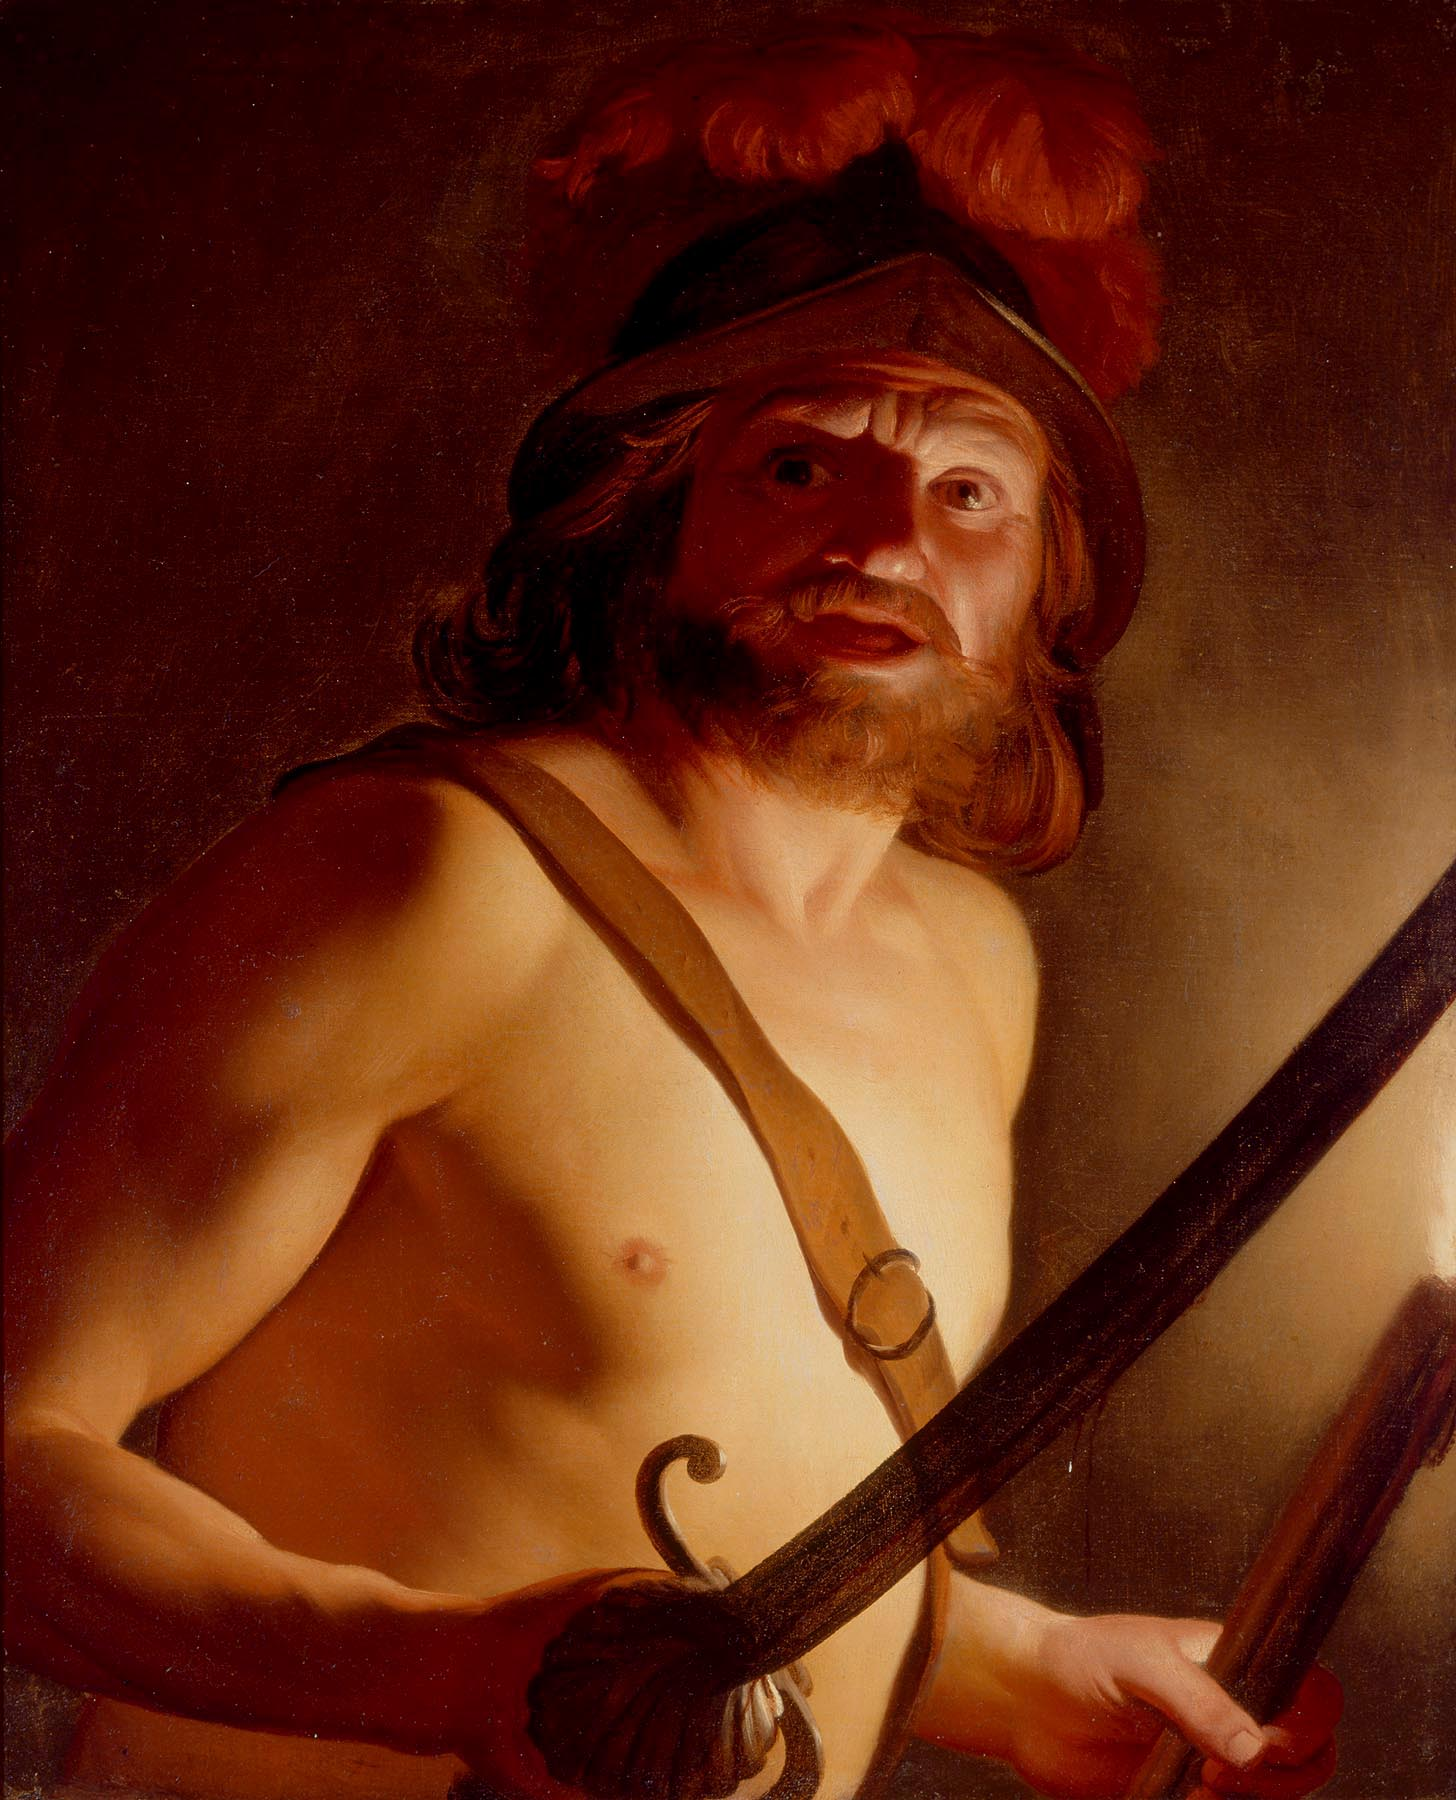 Gerrit van Honthorst (Dutch, 1590–1656, active in Italy), Mars, God of War, 1624/27. Oil on canvas. Milwaukee Art Museum, Gift of Mr. and Mrs. Myron Laskin M1975.121. Photo credit: Larry Sanders.